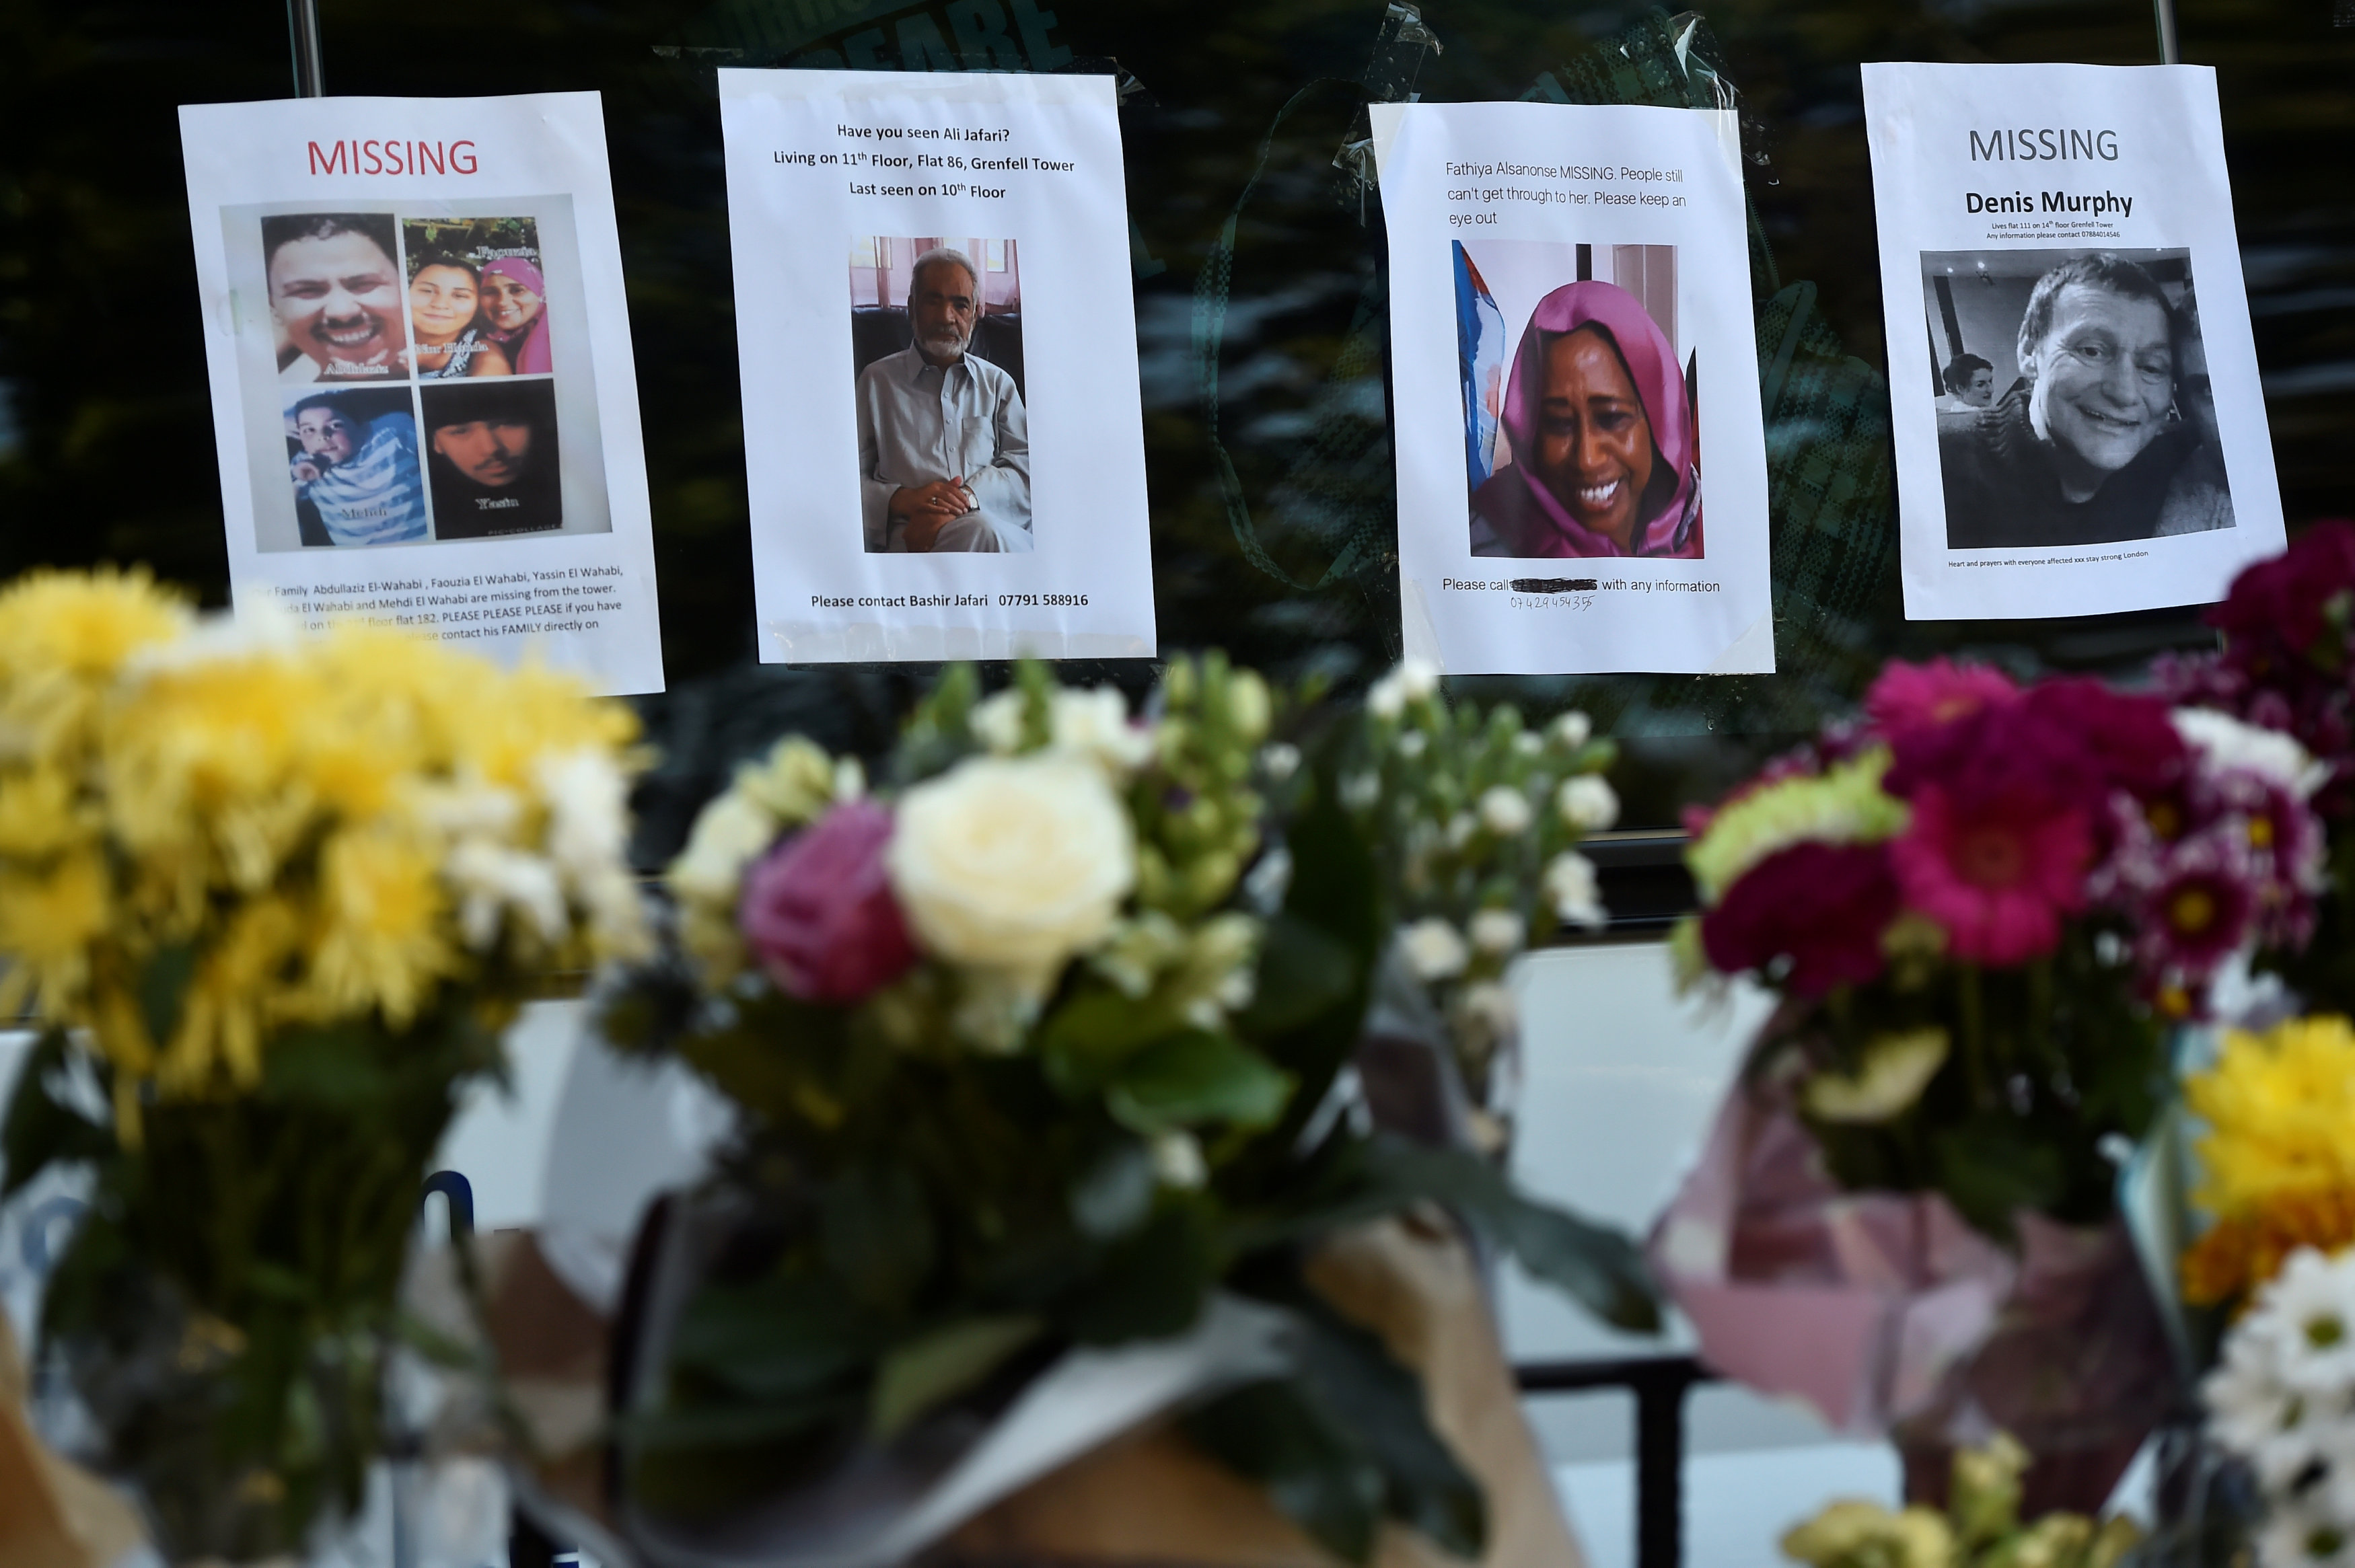 باقات زهور أمام صور ضحايا حريق لندن